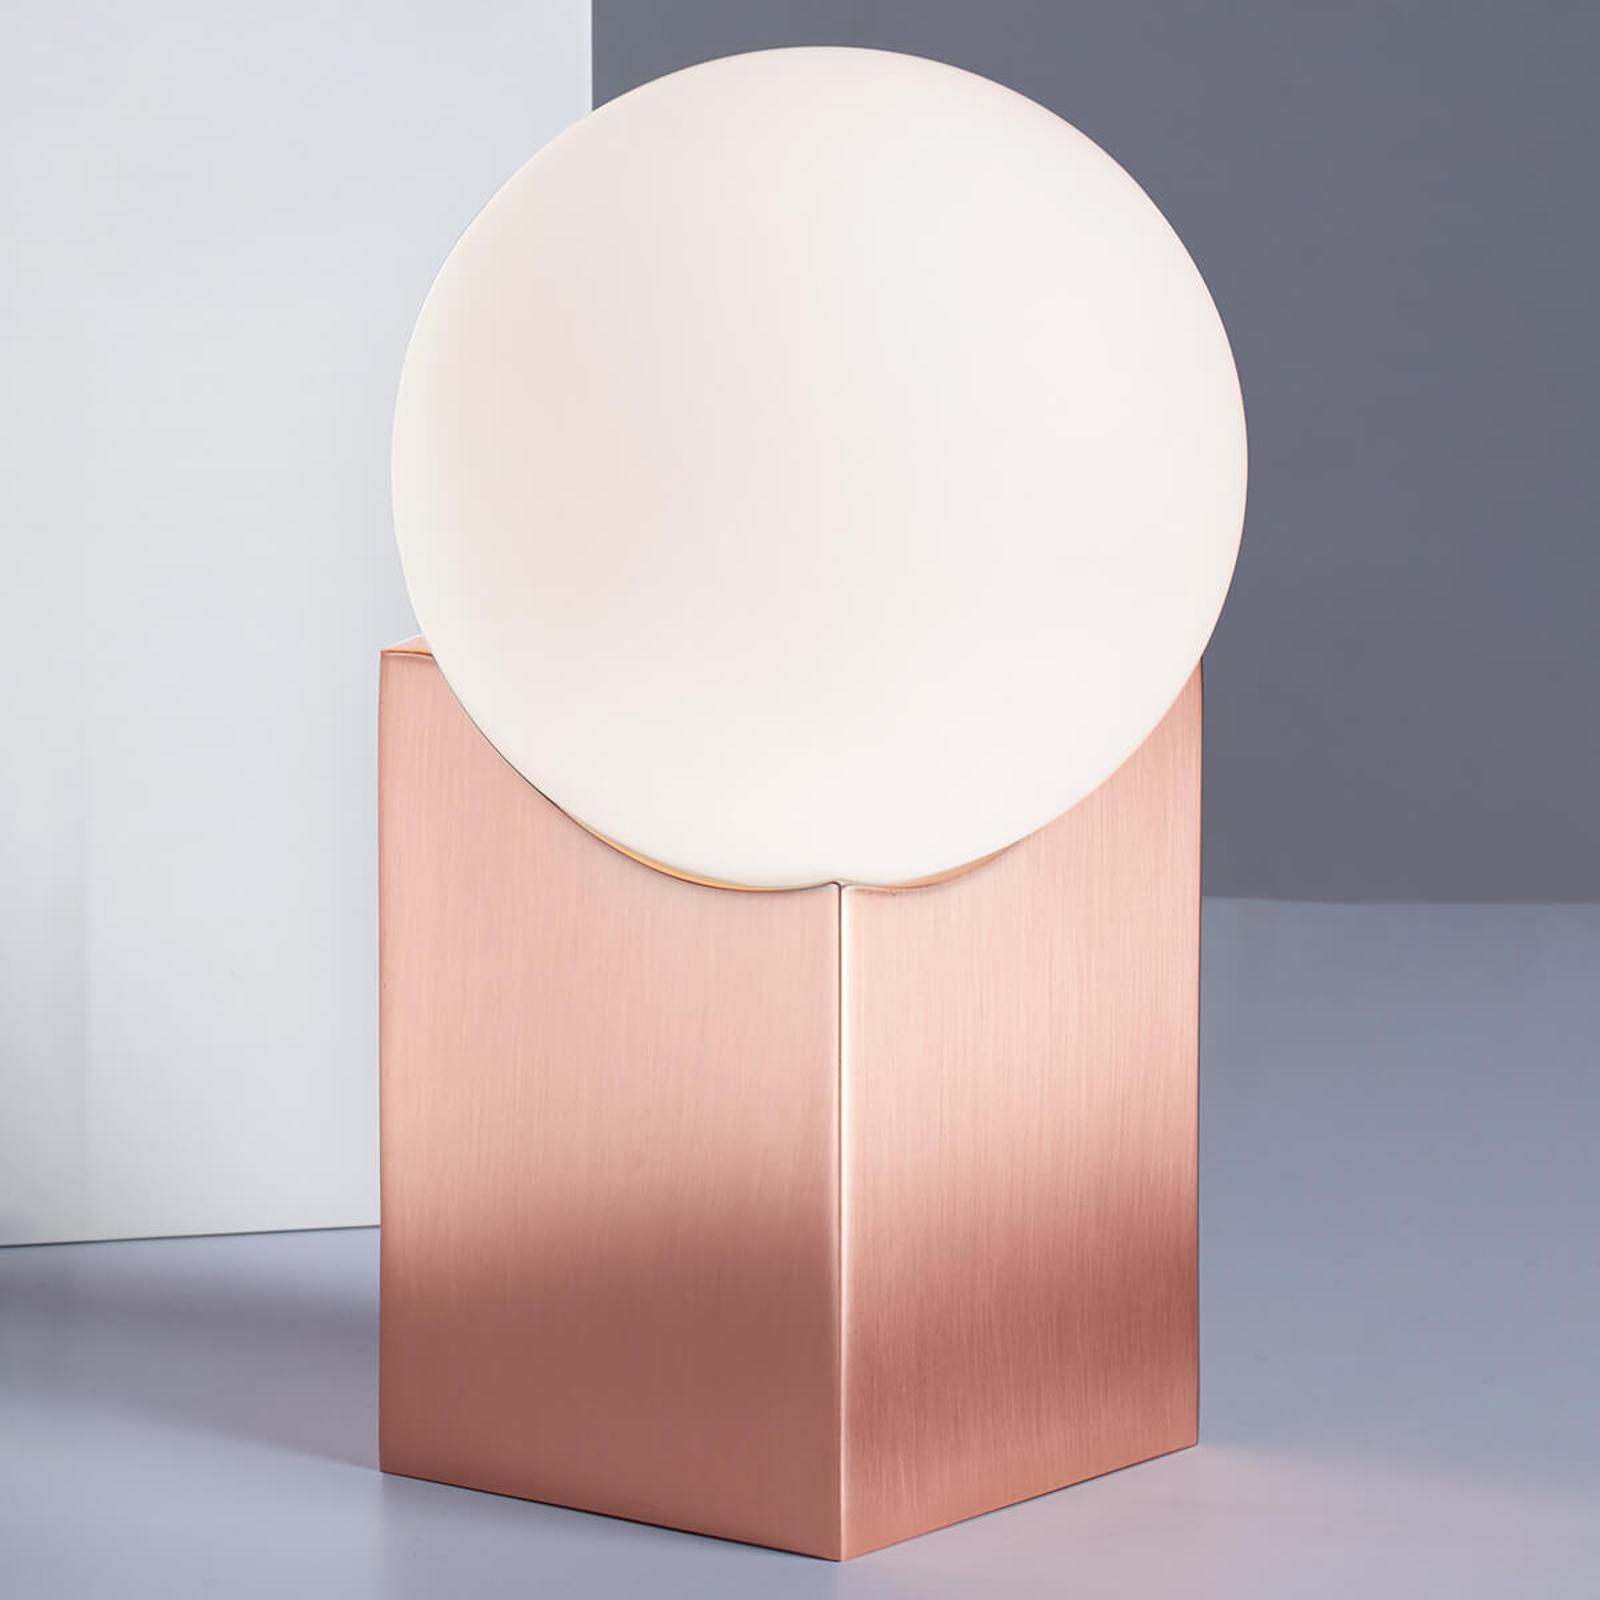 Tischlampe Cub 17,5 cm kupfer